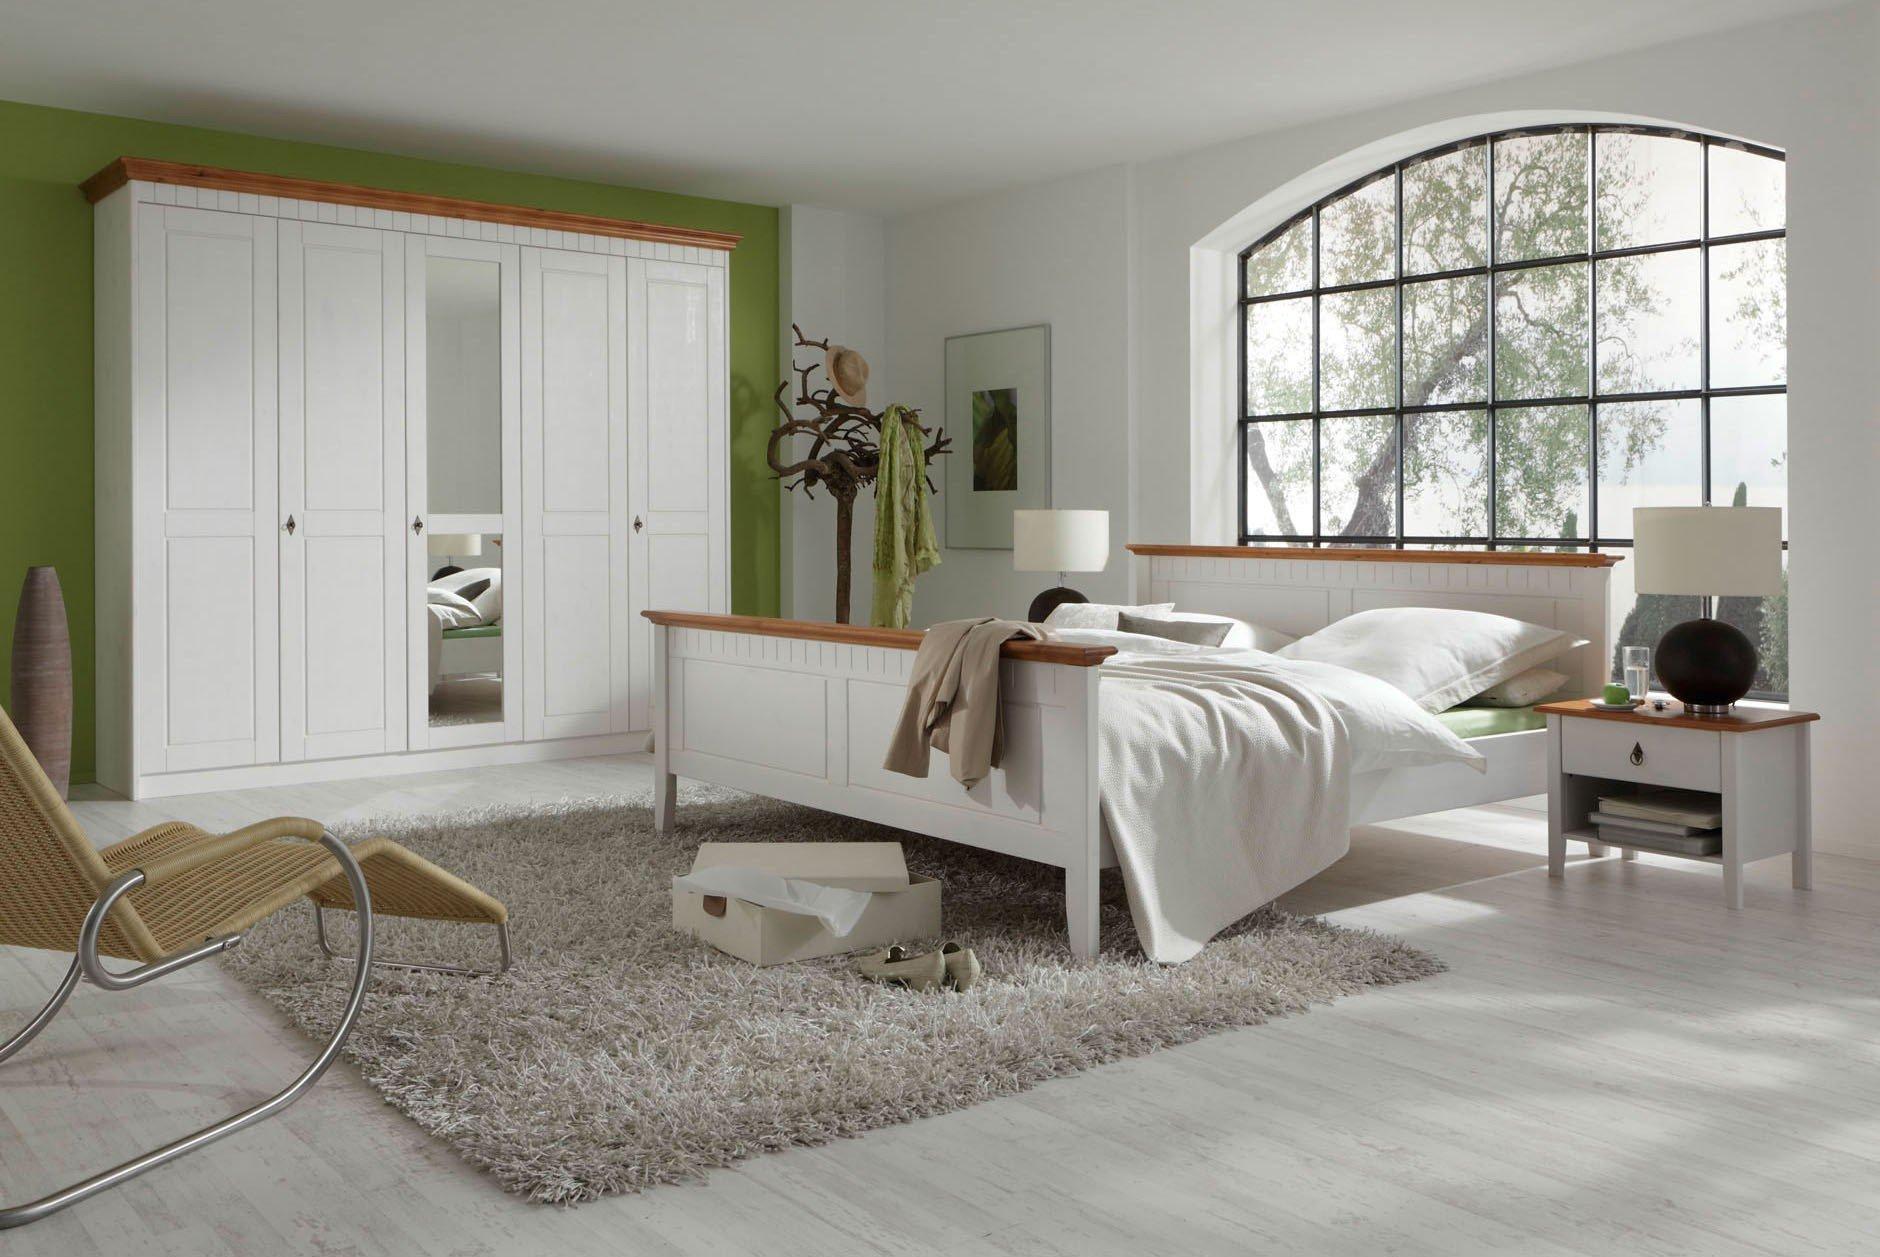 Forestdream capri komplett schlafzimmer kiefer wei for Schlafzimmer komplett angebot